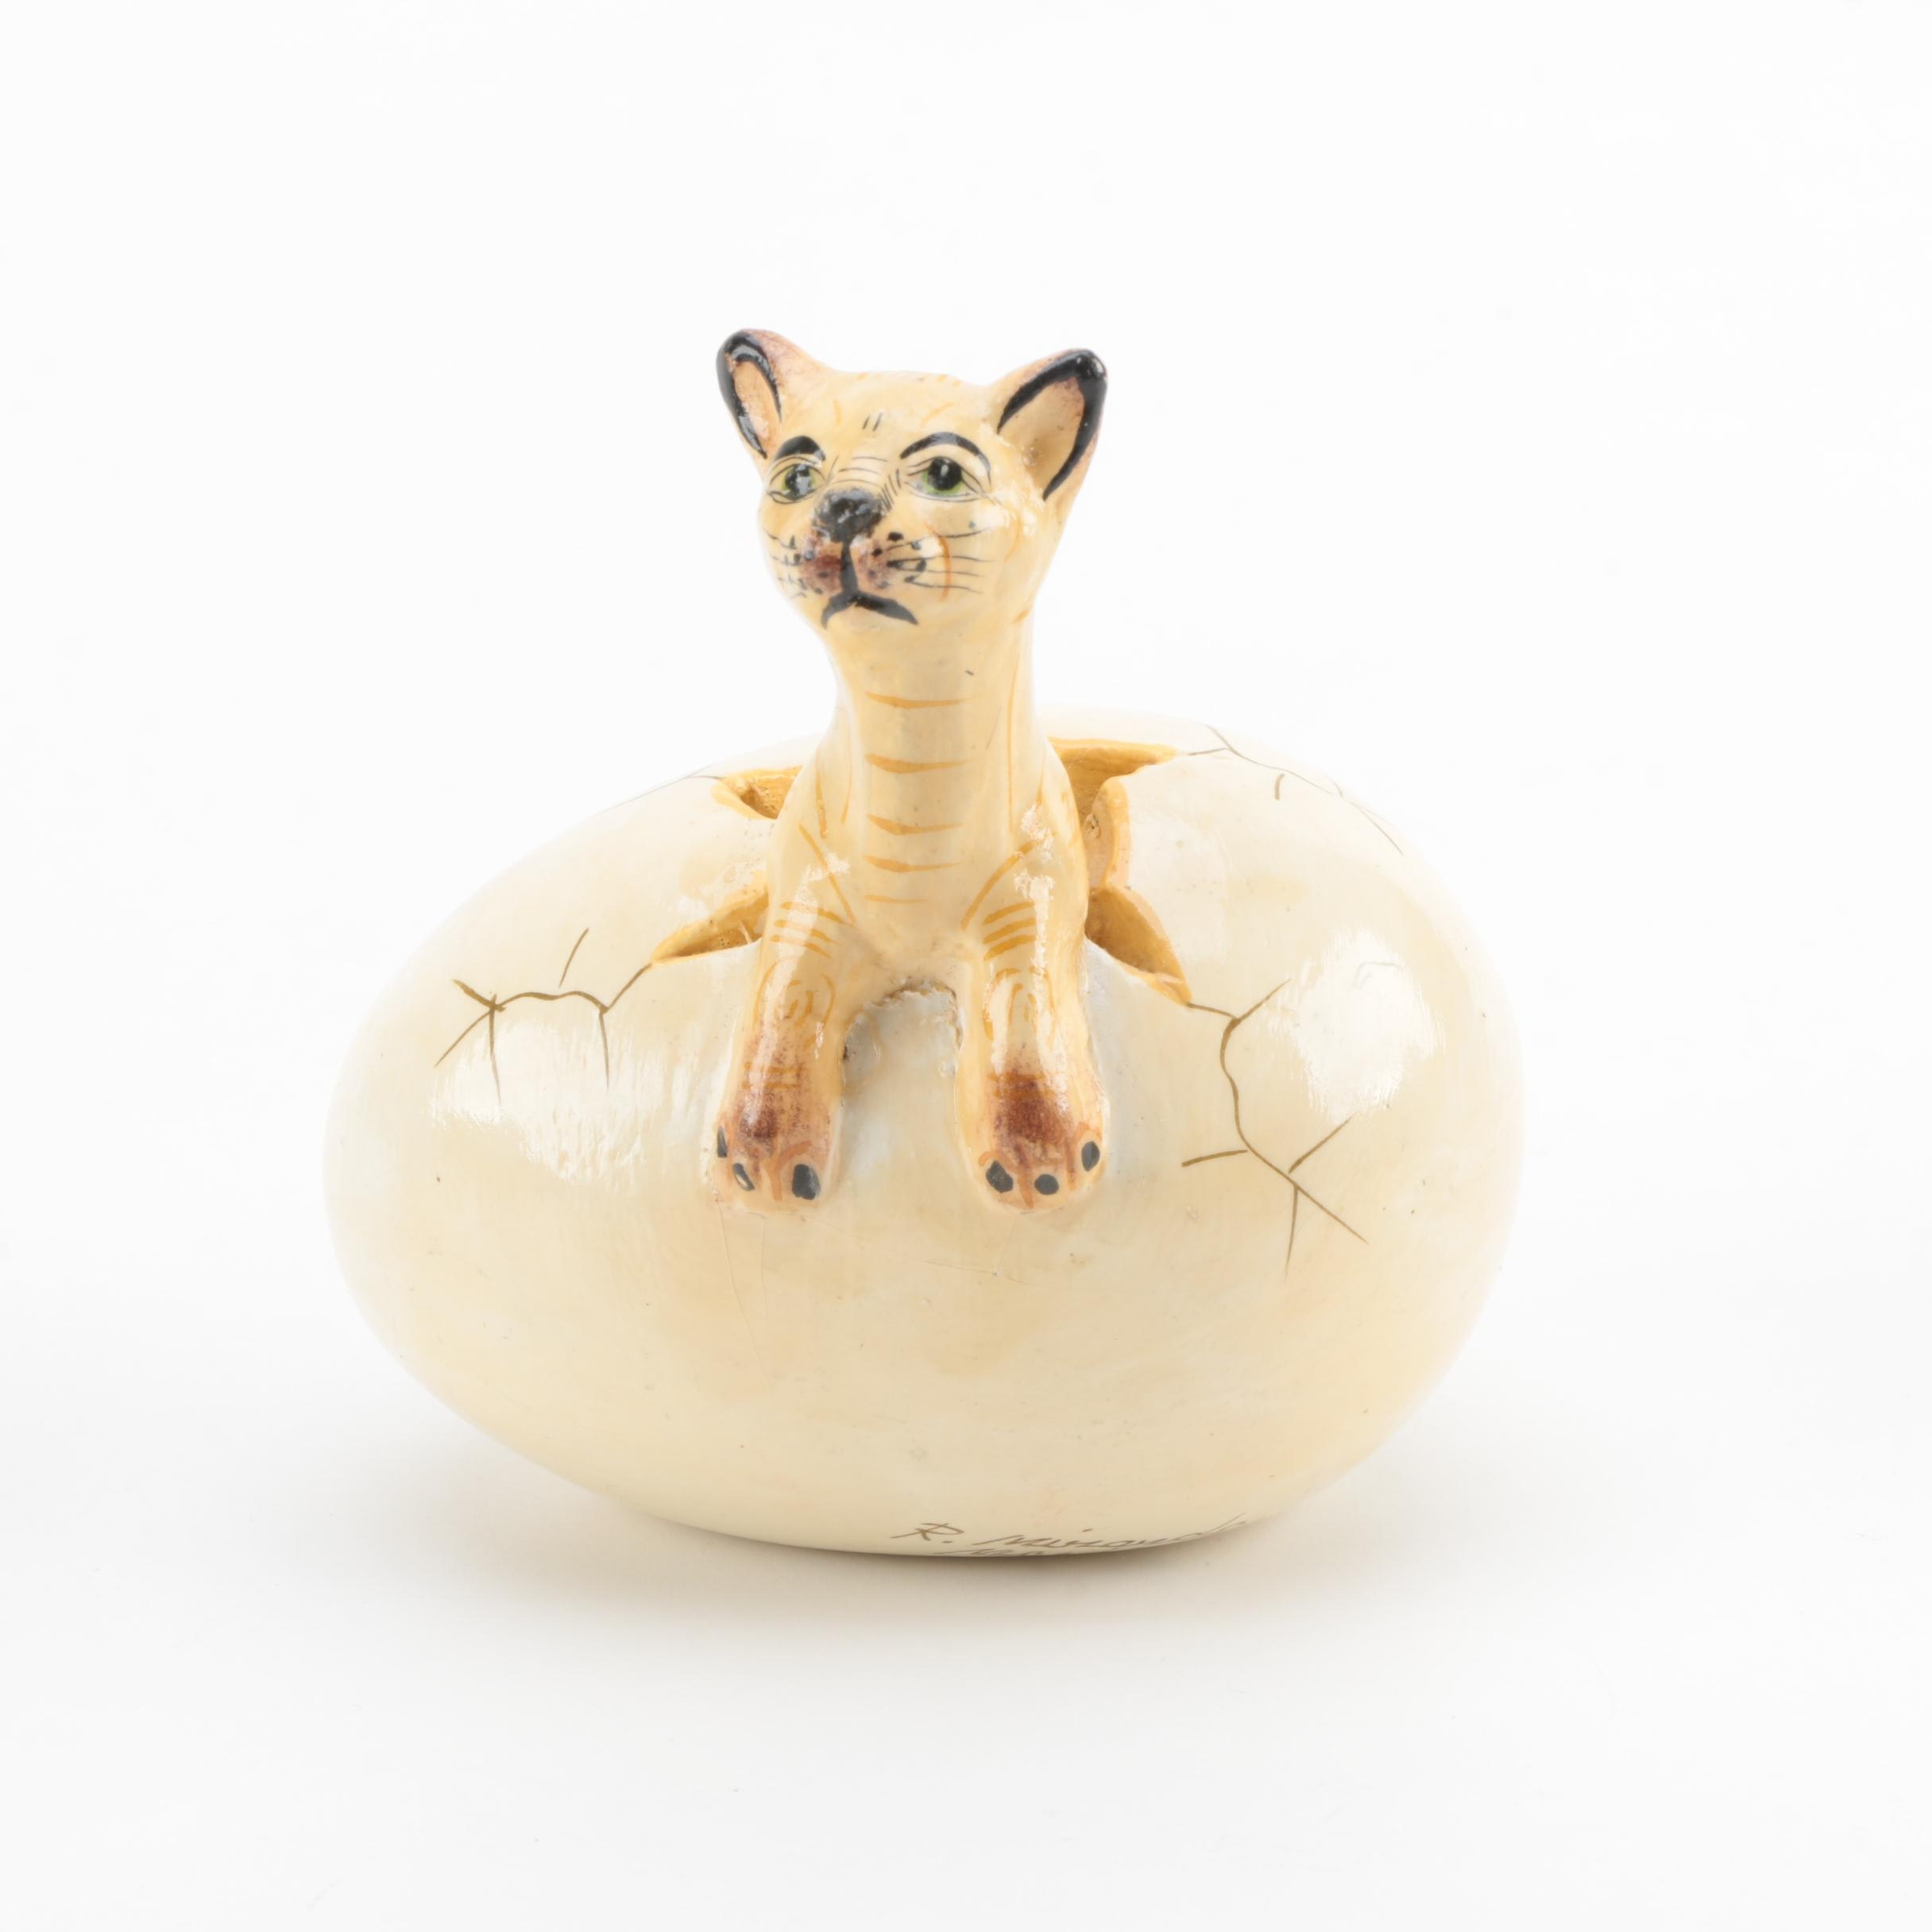 R. Miranda Signed Mexican Egg-Hatchling Cat Figurine